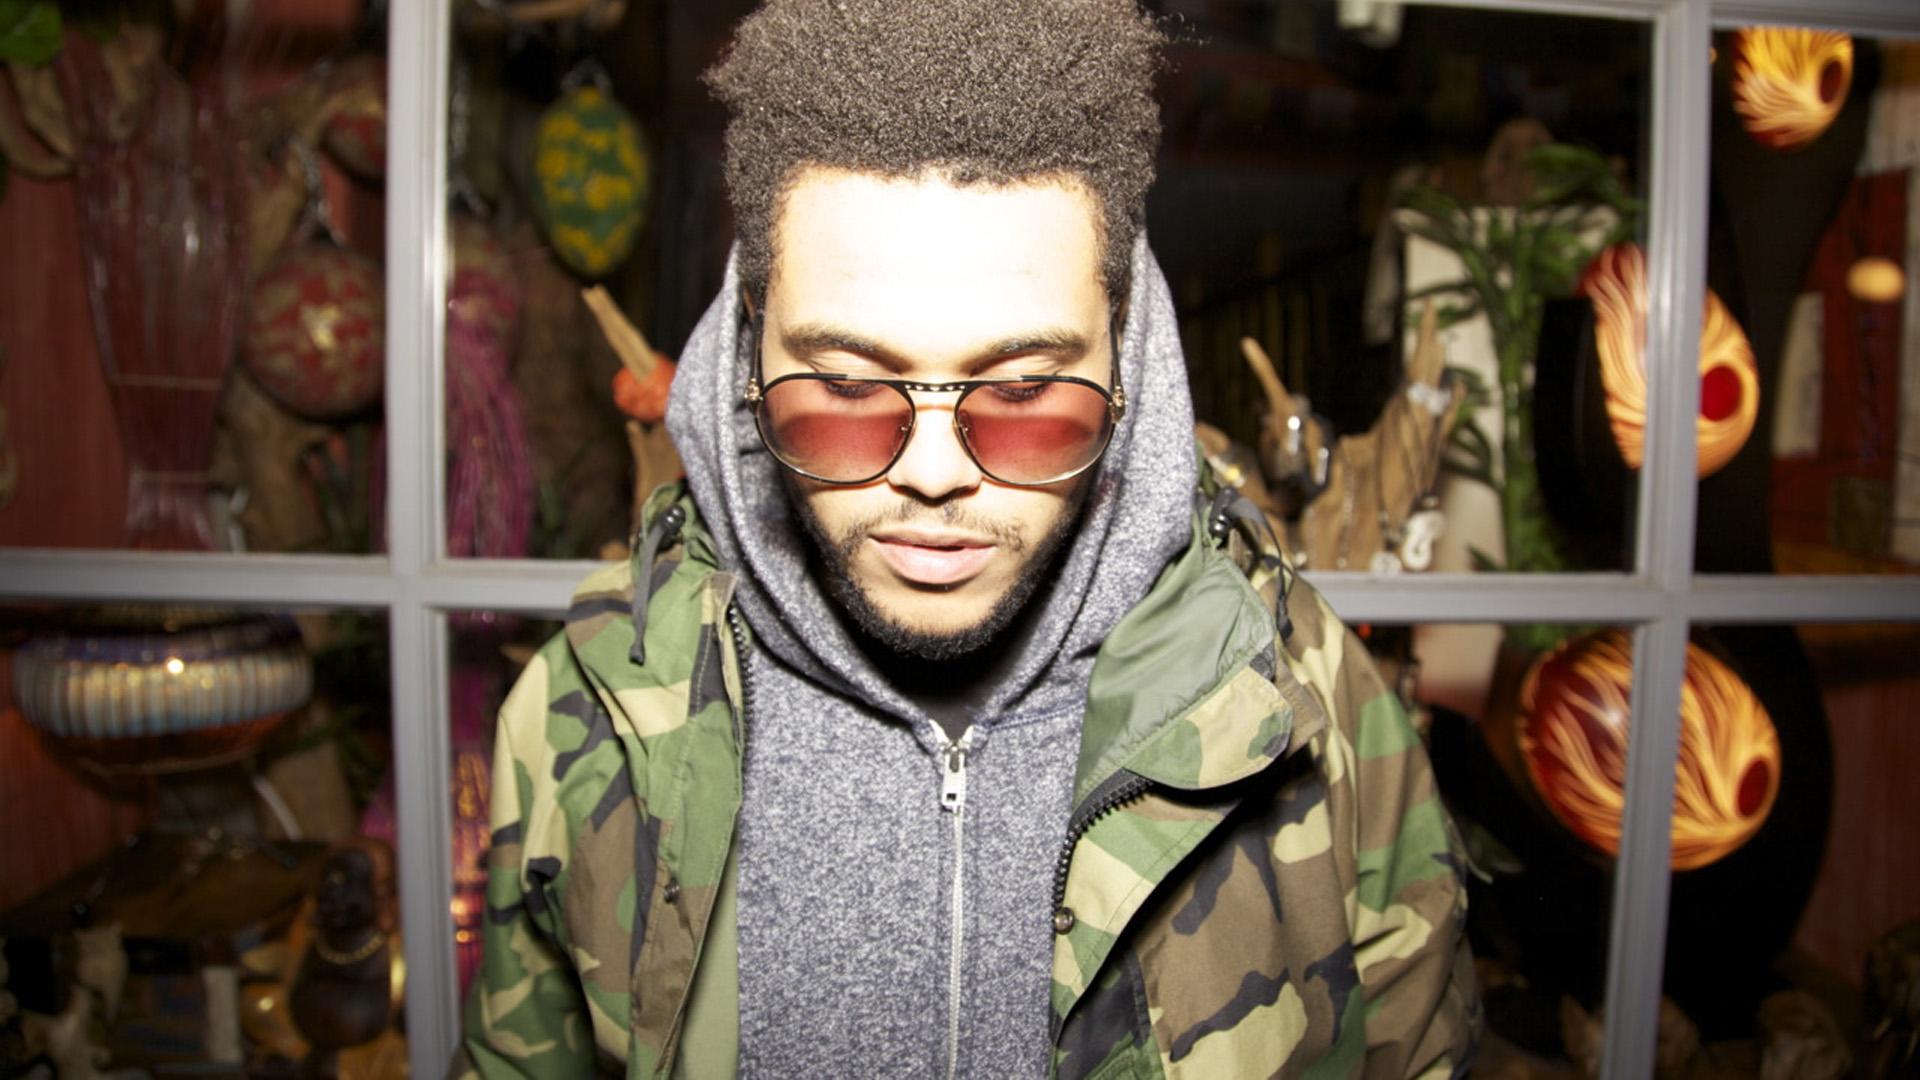 The Weeknd Wallpaper Iphone Wallpaper The Weeknd Xo Wallpapers